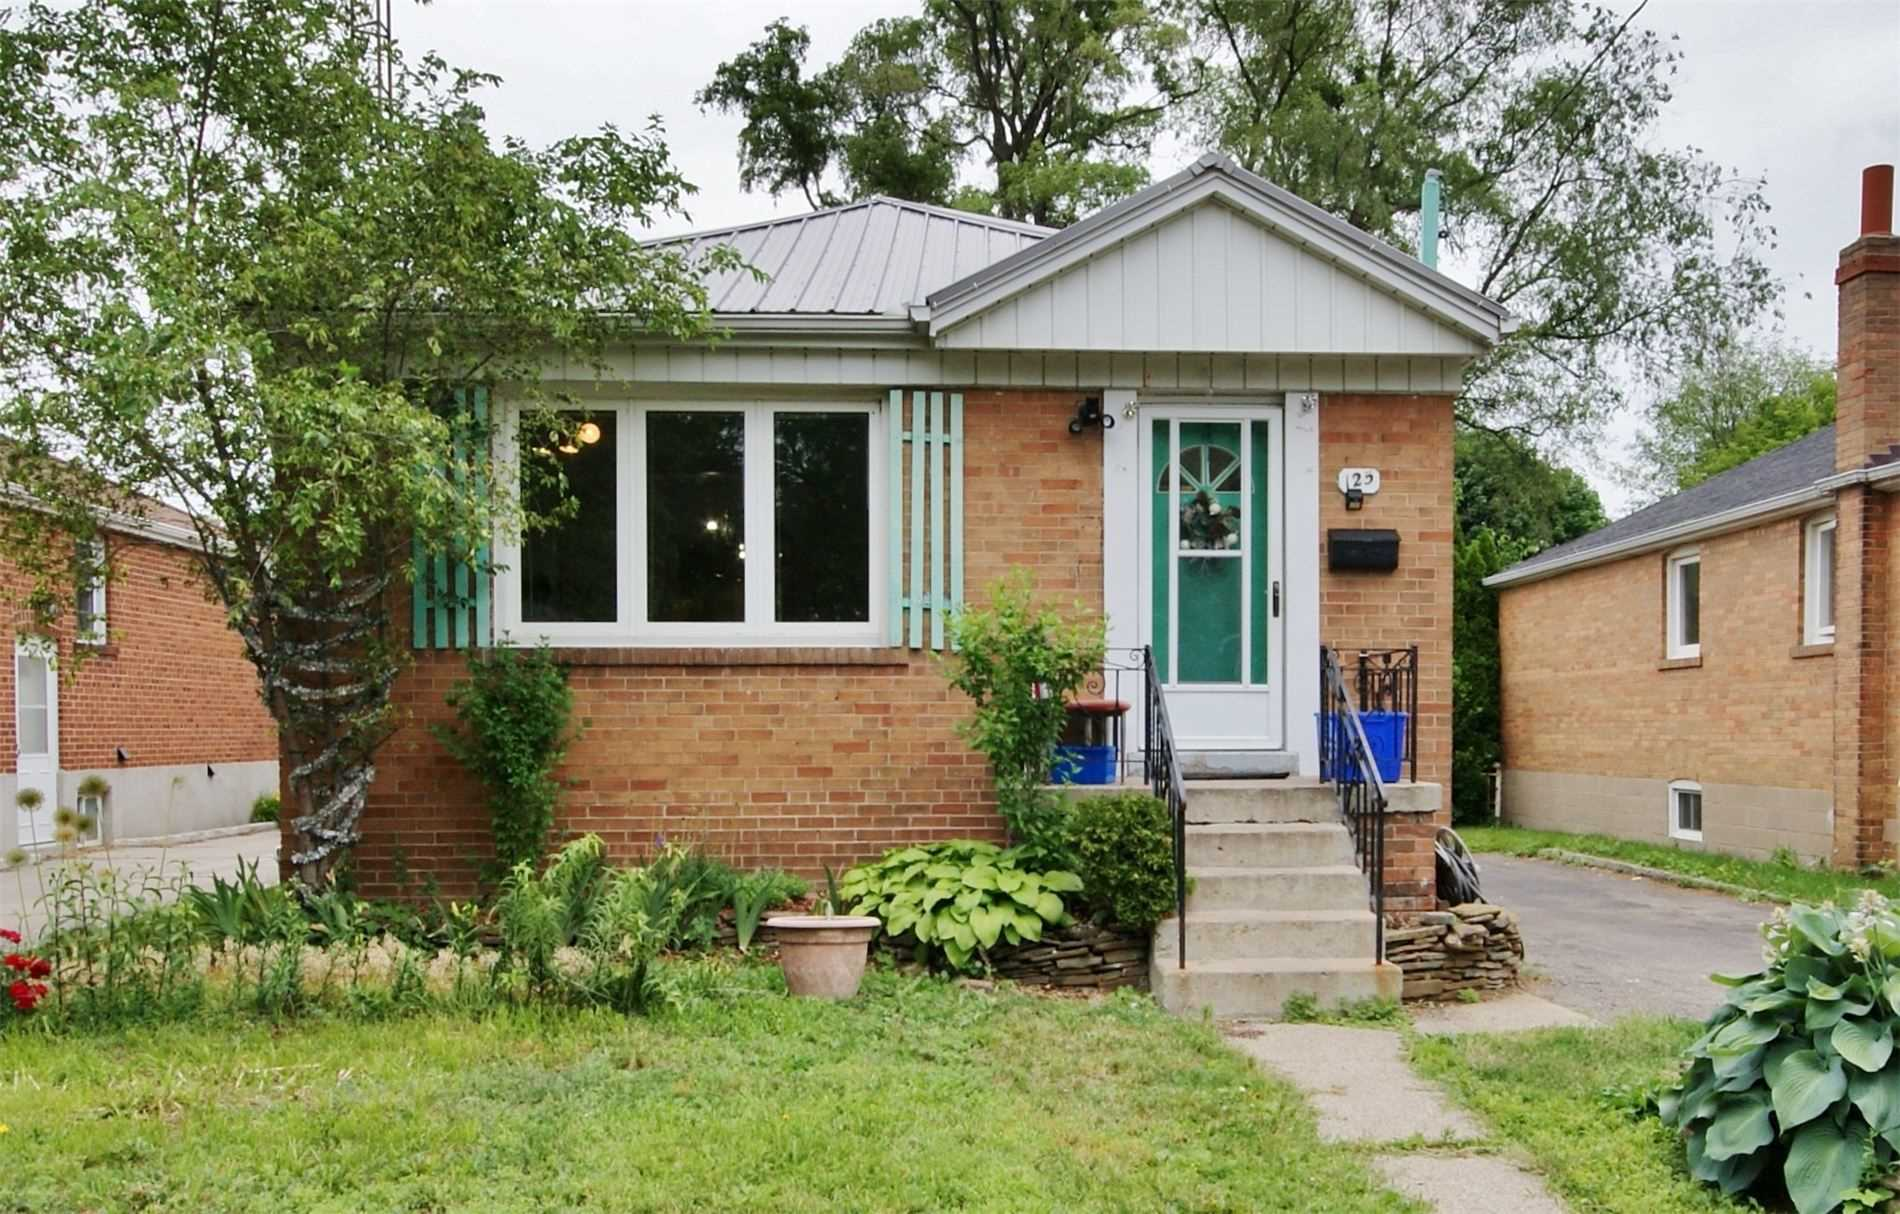 125 North Carson St - Alderwood Detached for sale, 3 Bedrooms (W5409480) - #1